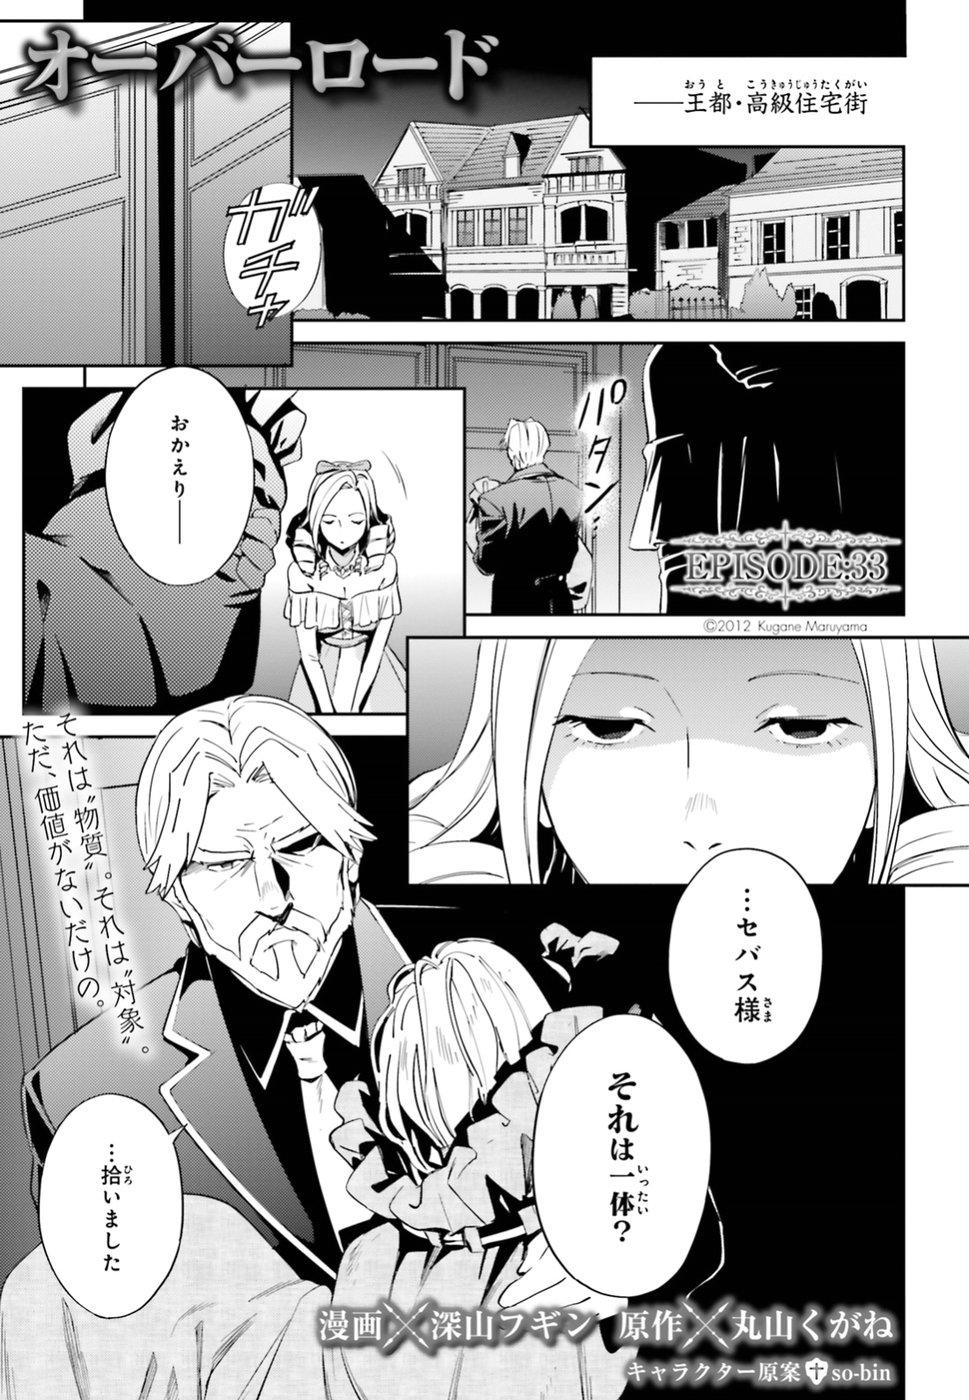 Overlord Manga Chapter 33